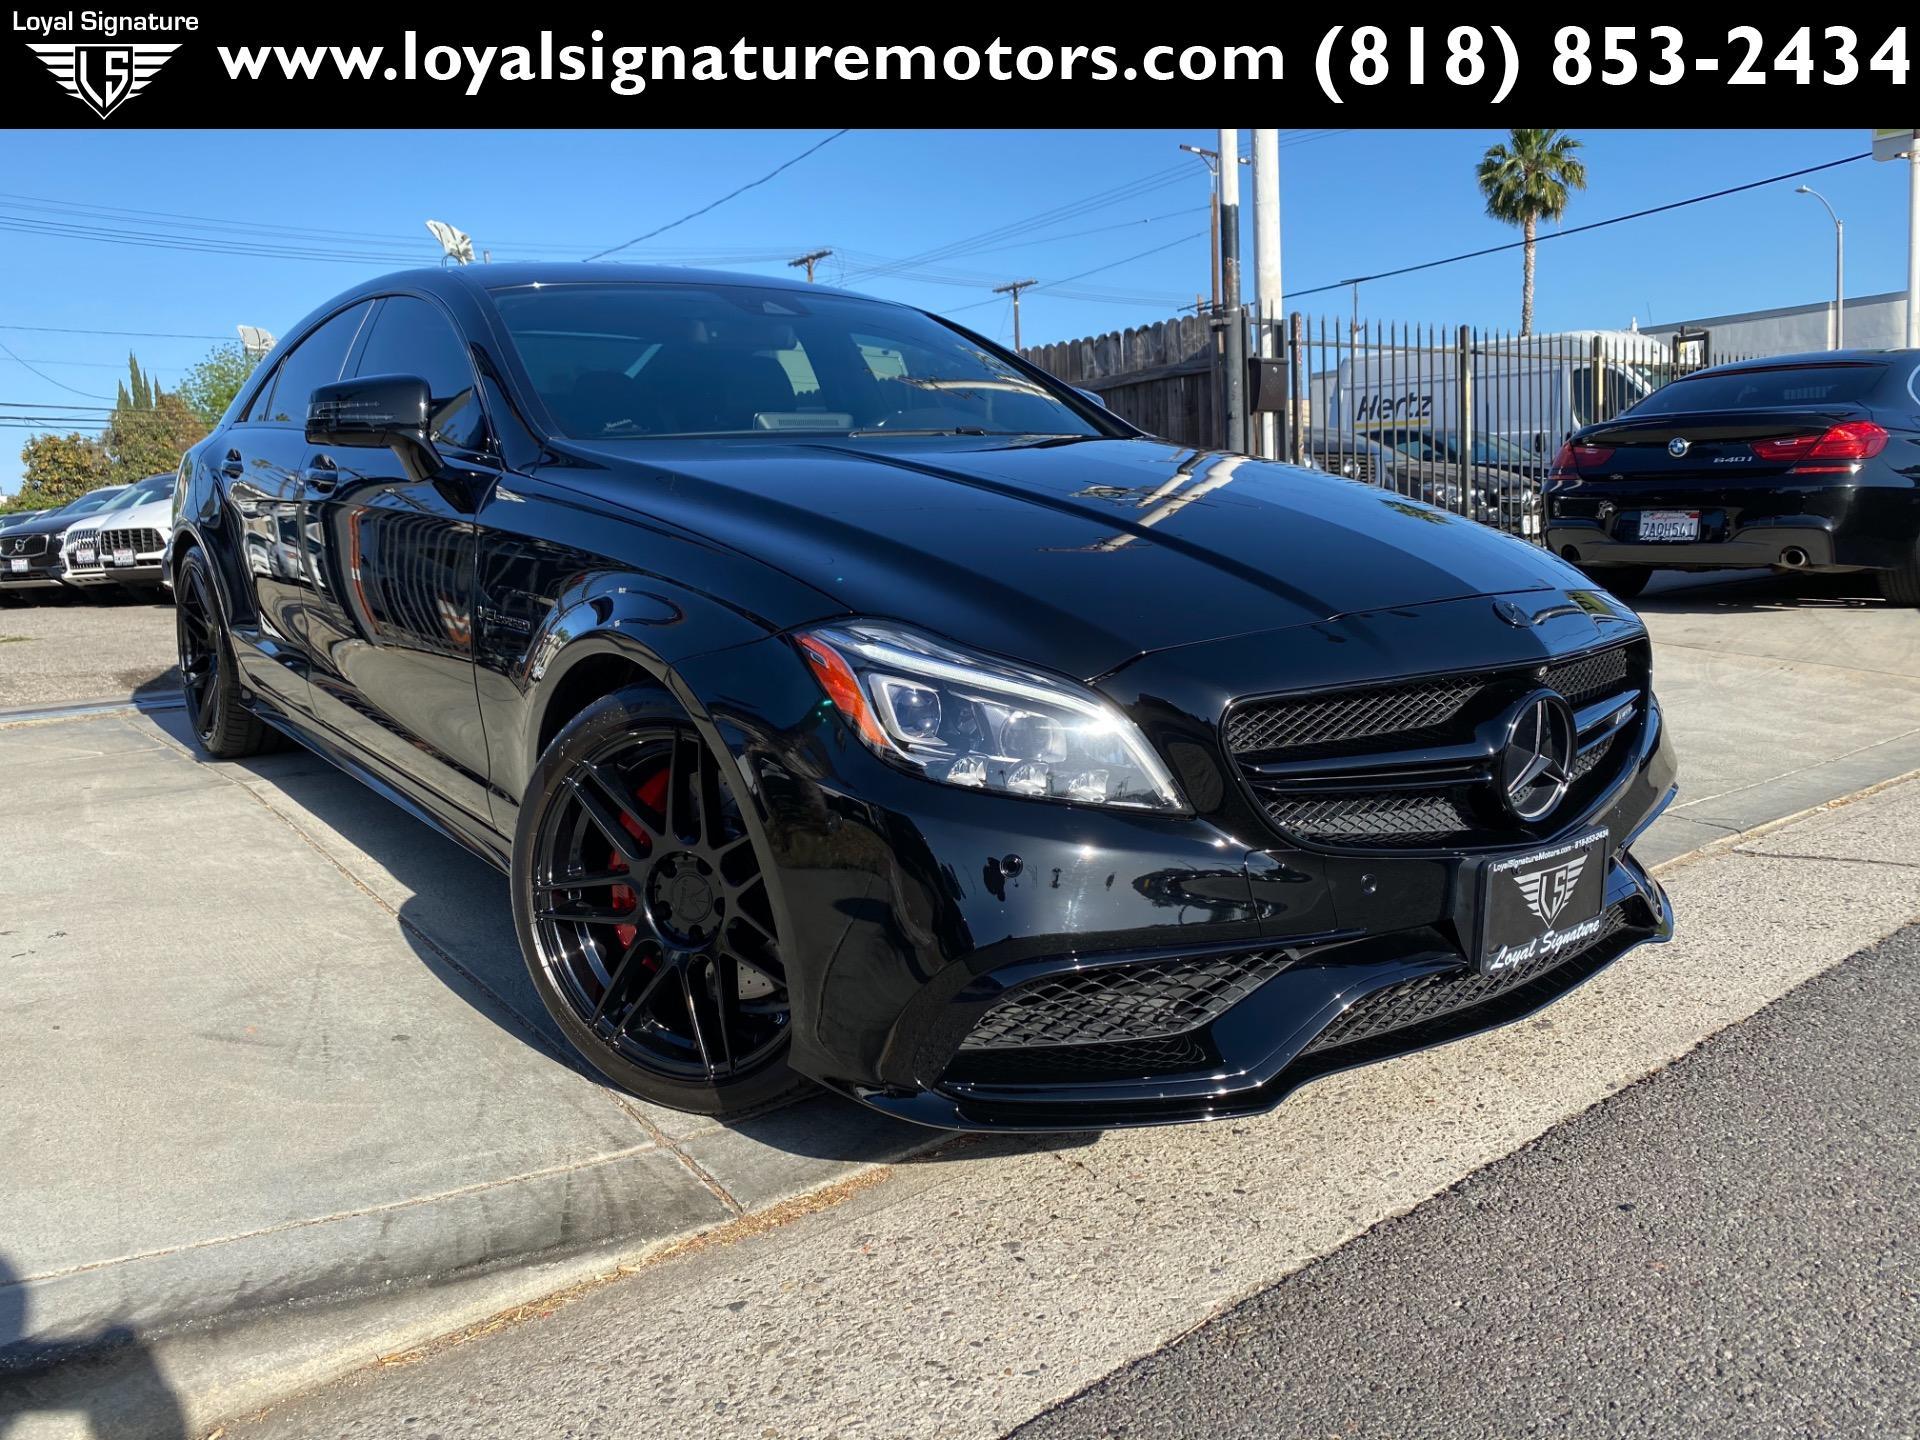 Used 2015 Mercedes-Benz CLS CLS 63 AMG S-Model | Van Nuys, CA